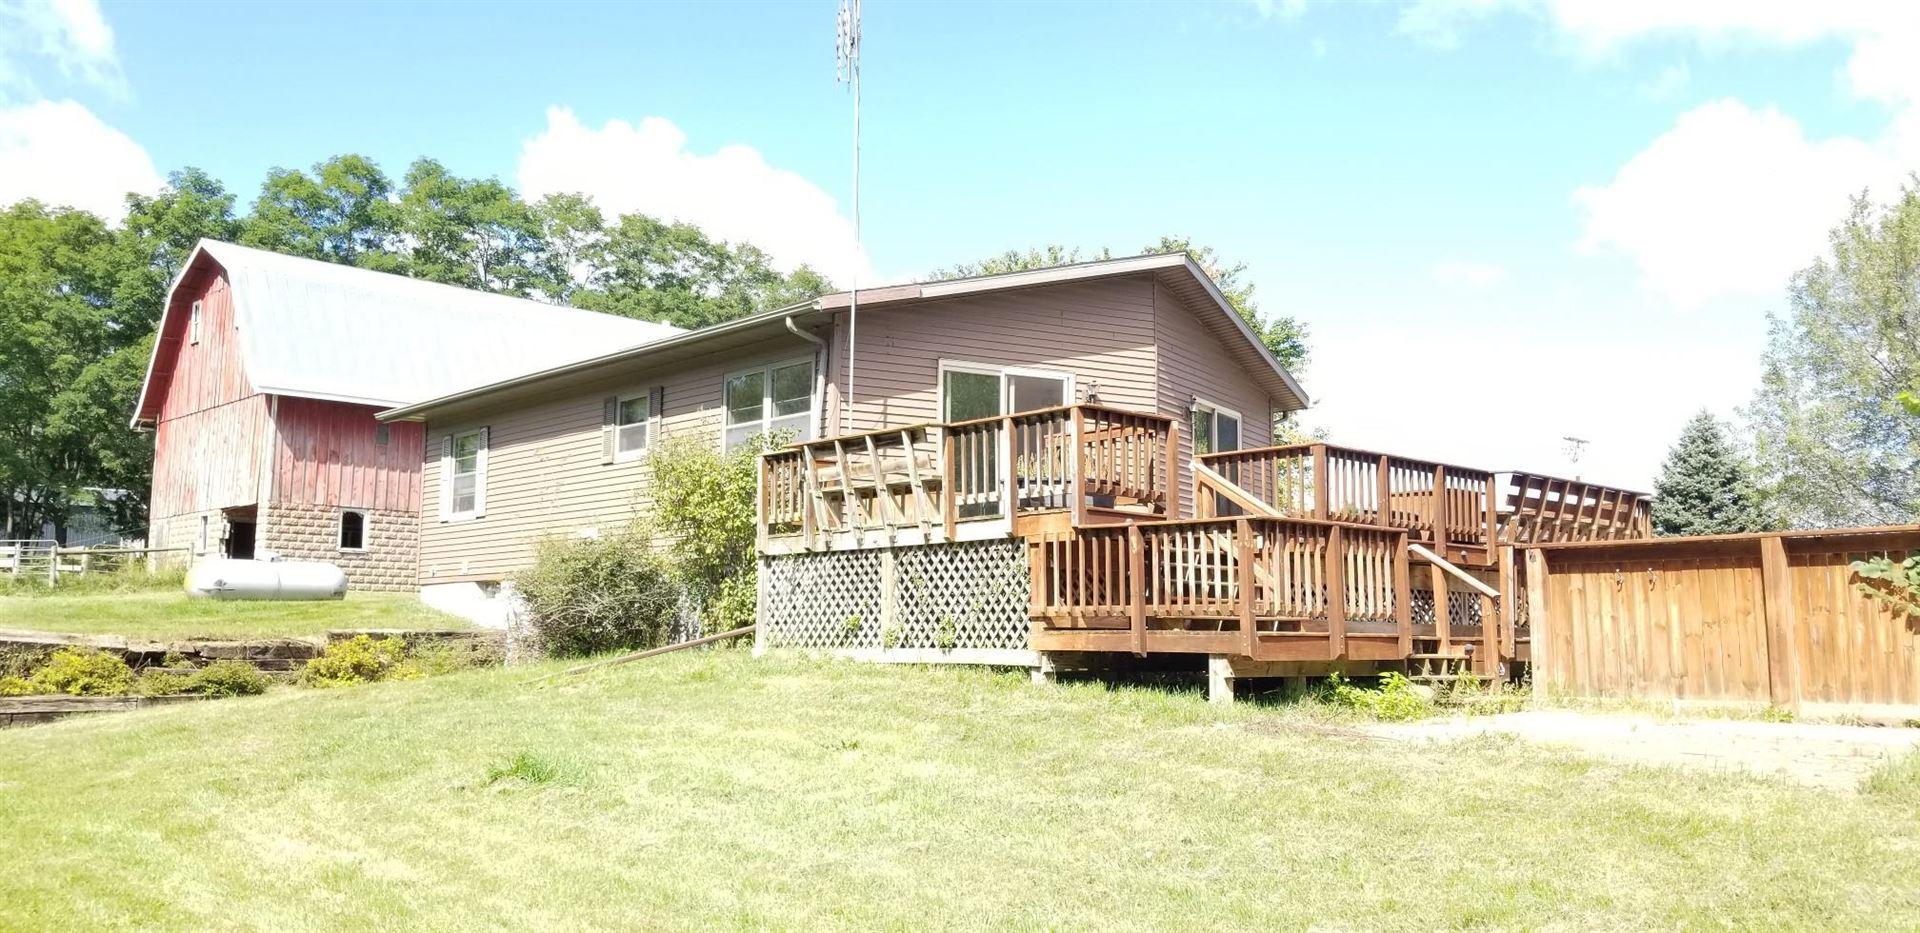 W4255 County Road Q, Farmington, WI 54644 - MLS#: 1762522